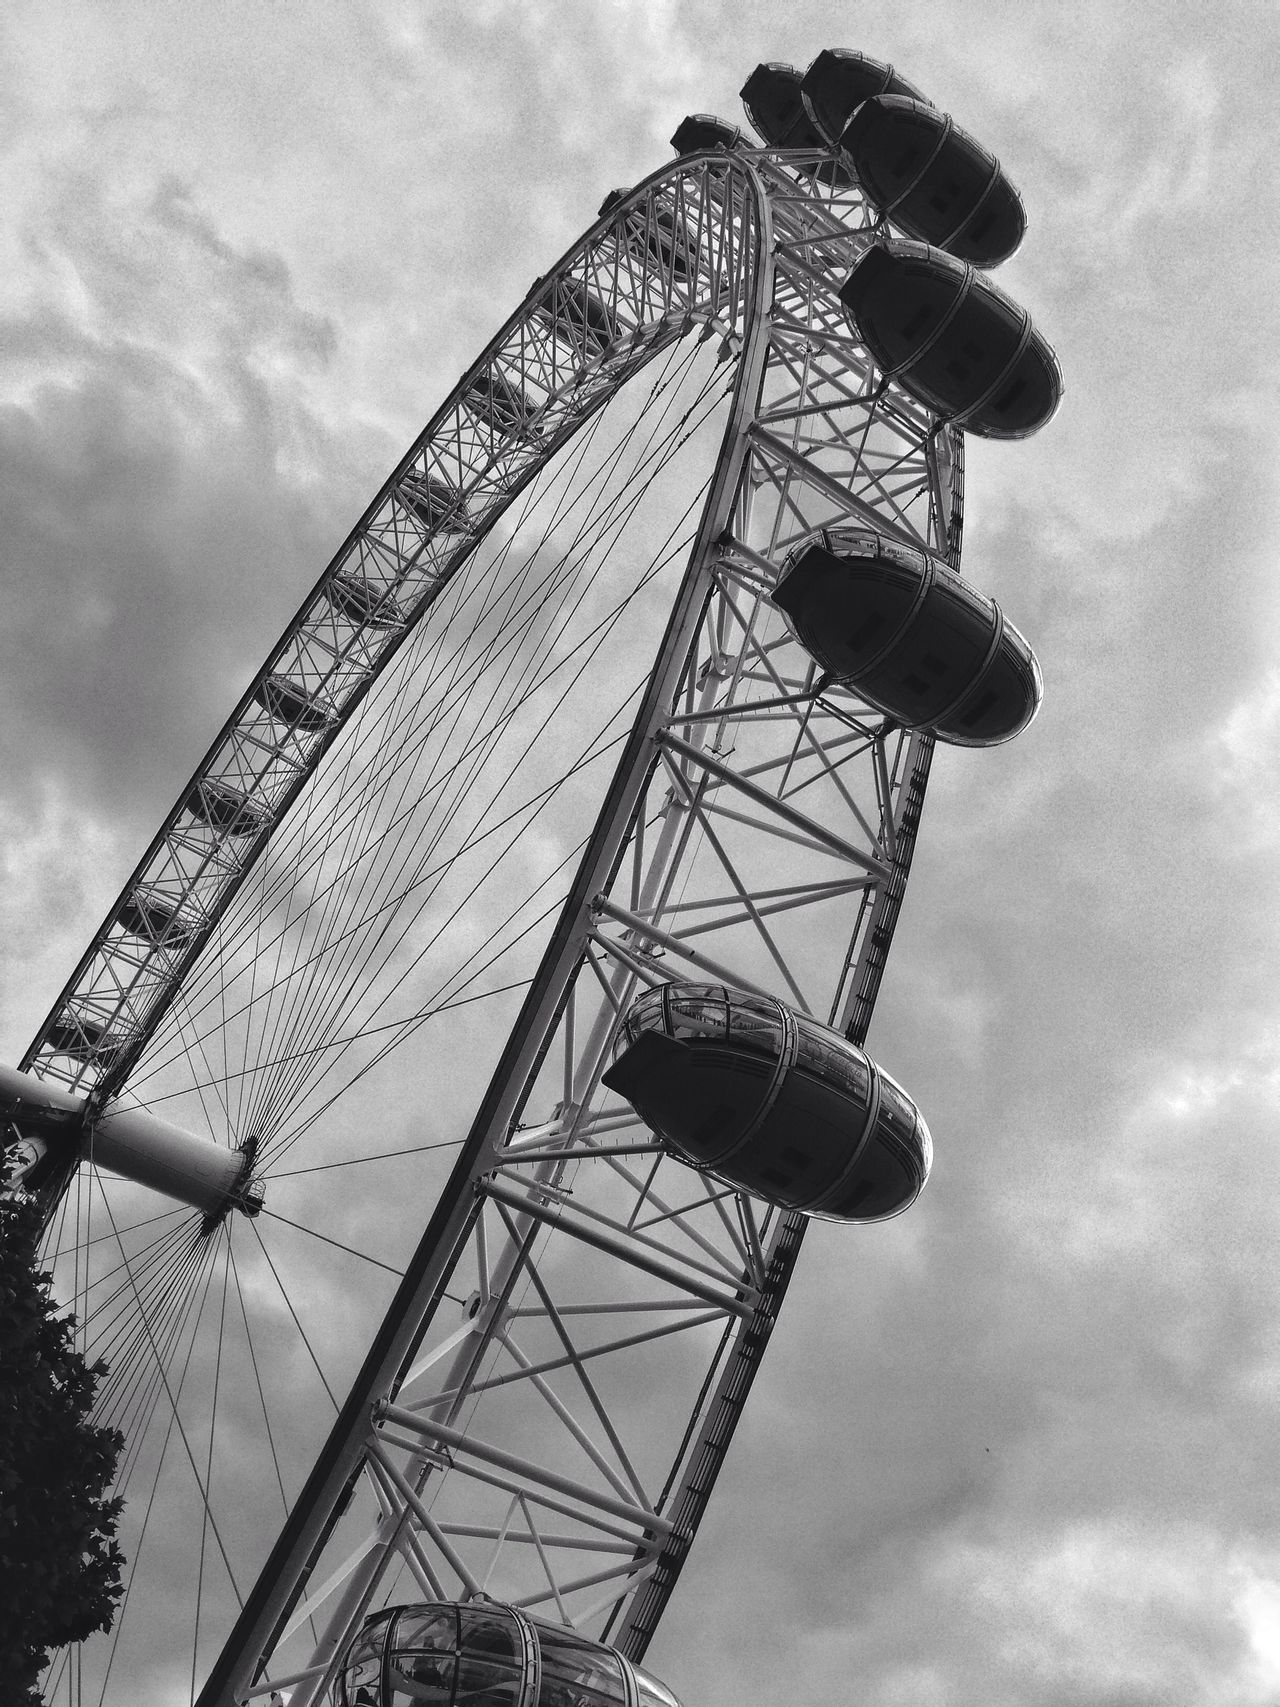 The Eye of London Amusement Park Big Wheel Black And White Photography City Europe Eye Of London Ferris Wheel London Low Angle View No People